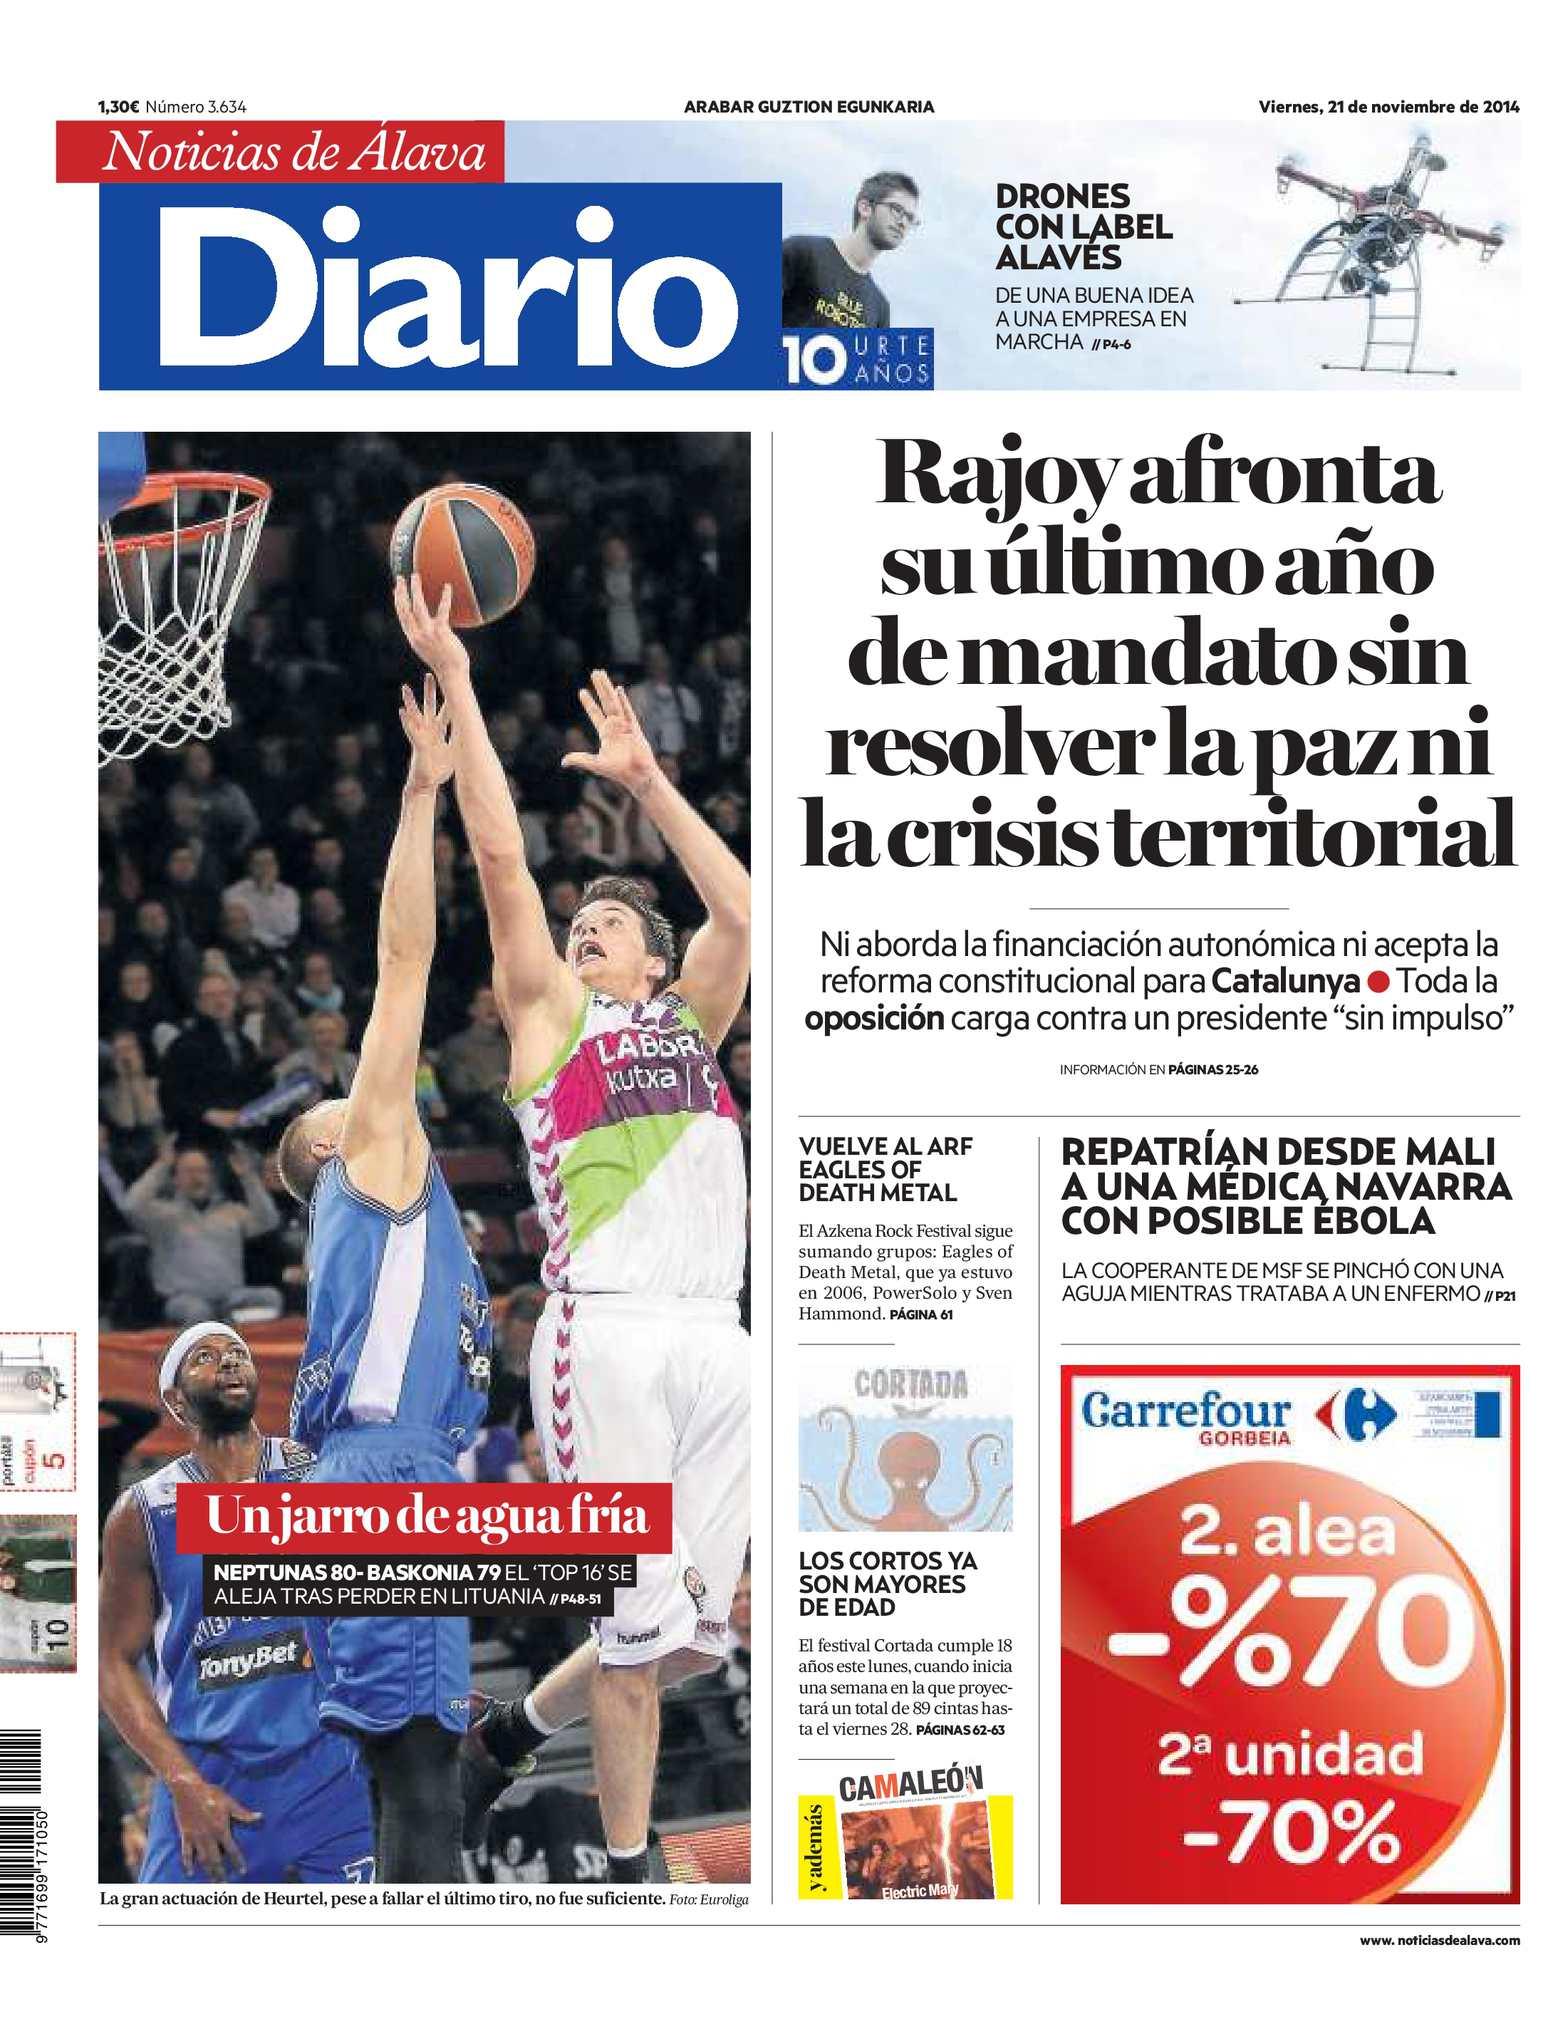 Calaméo Noticias 20141121 De Diario Álava 3L4RAj5